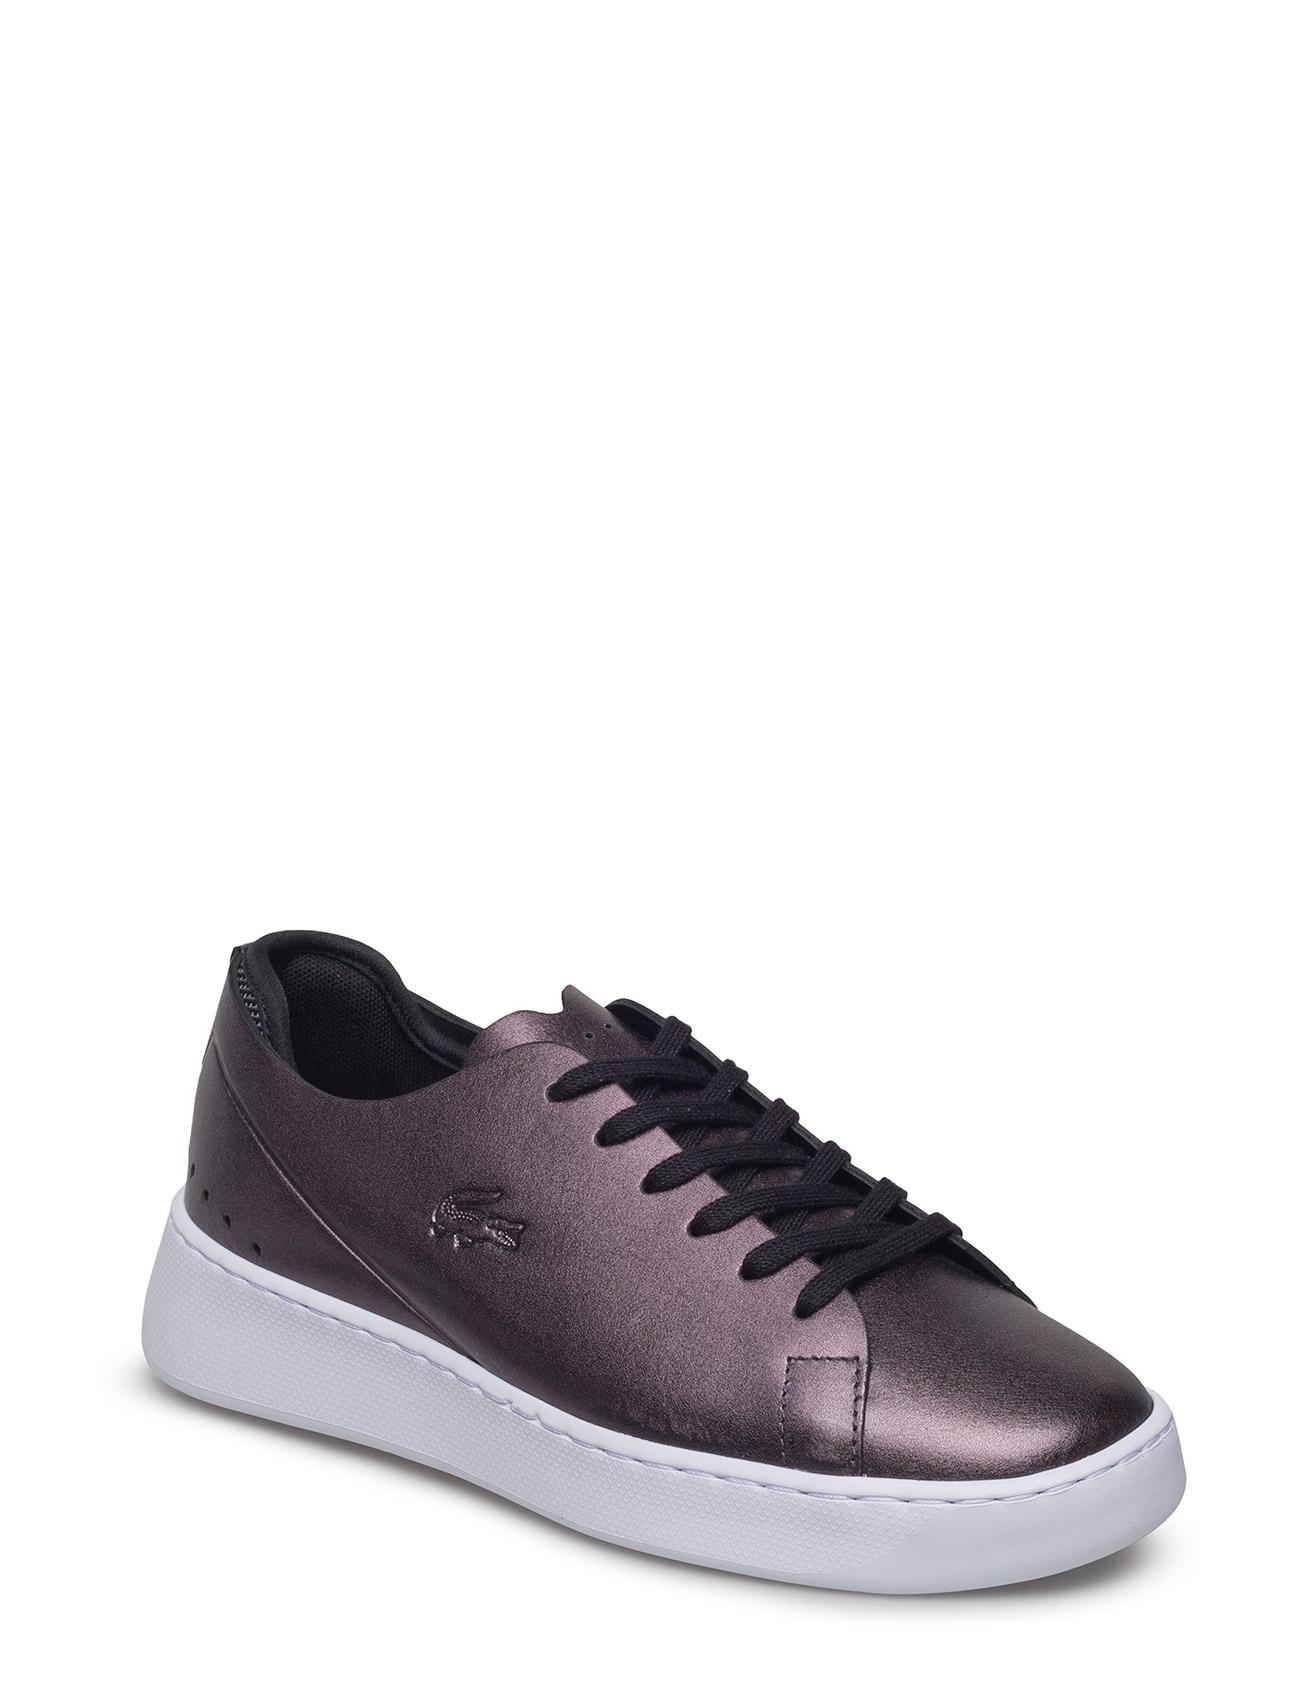 lacoste shoes – Eyyla 317 1 på boozt.com dk